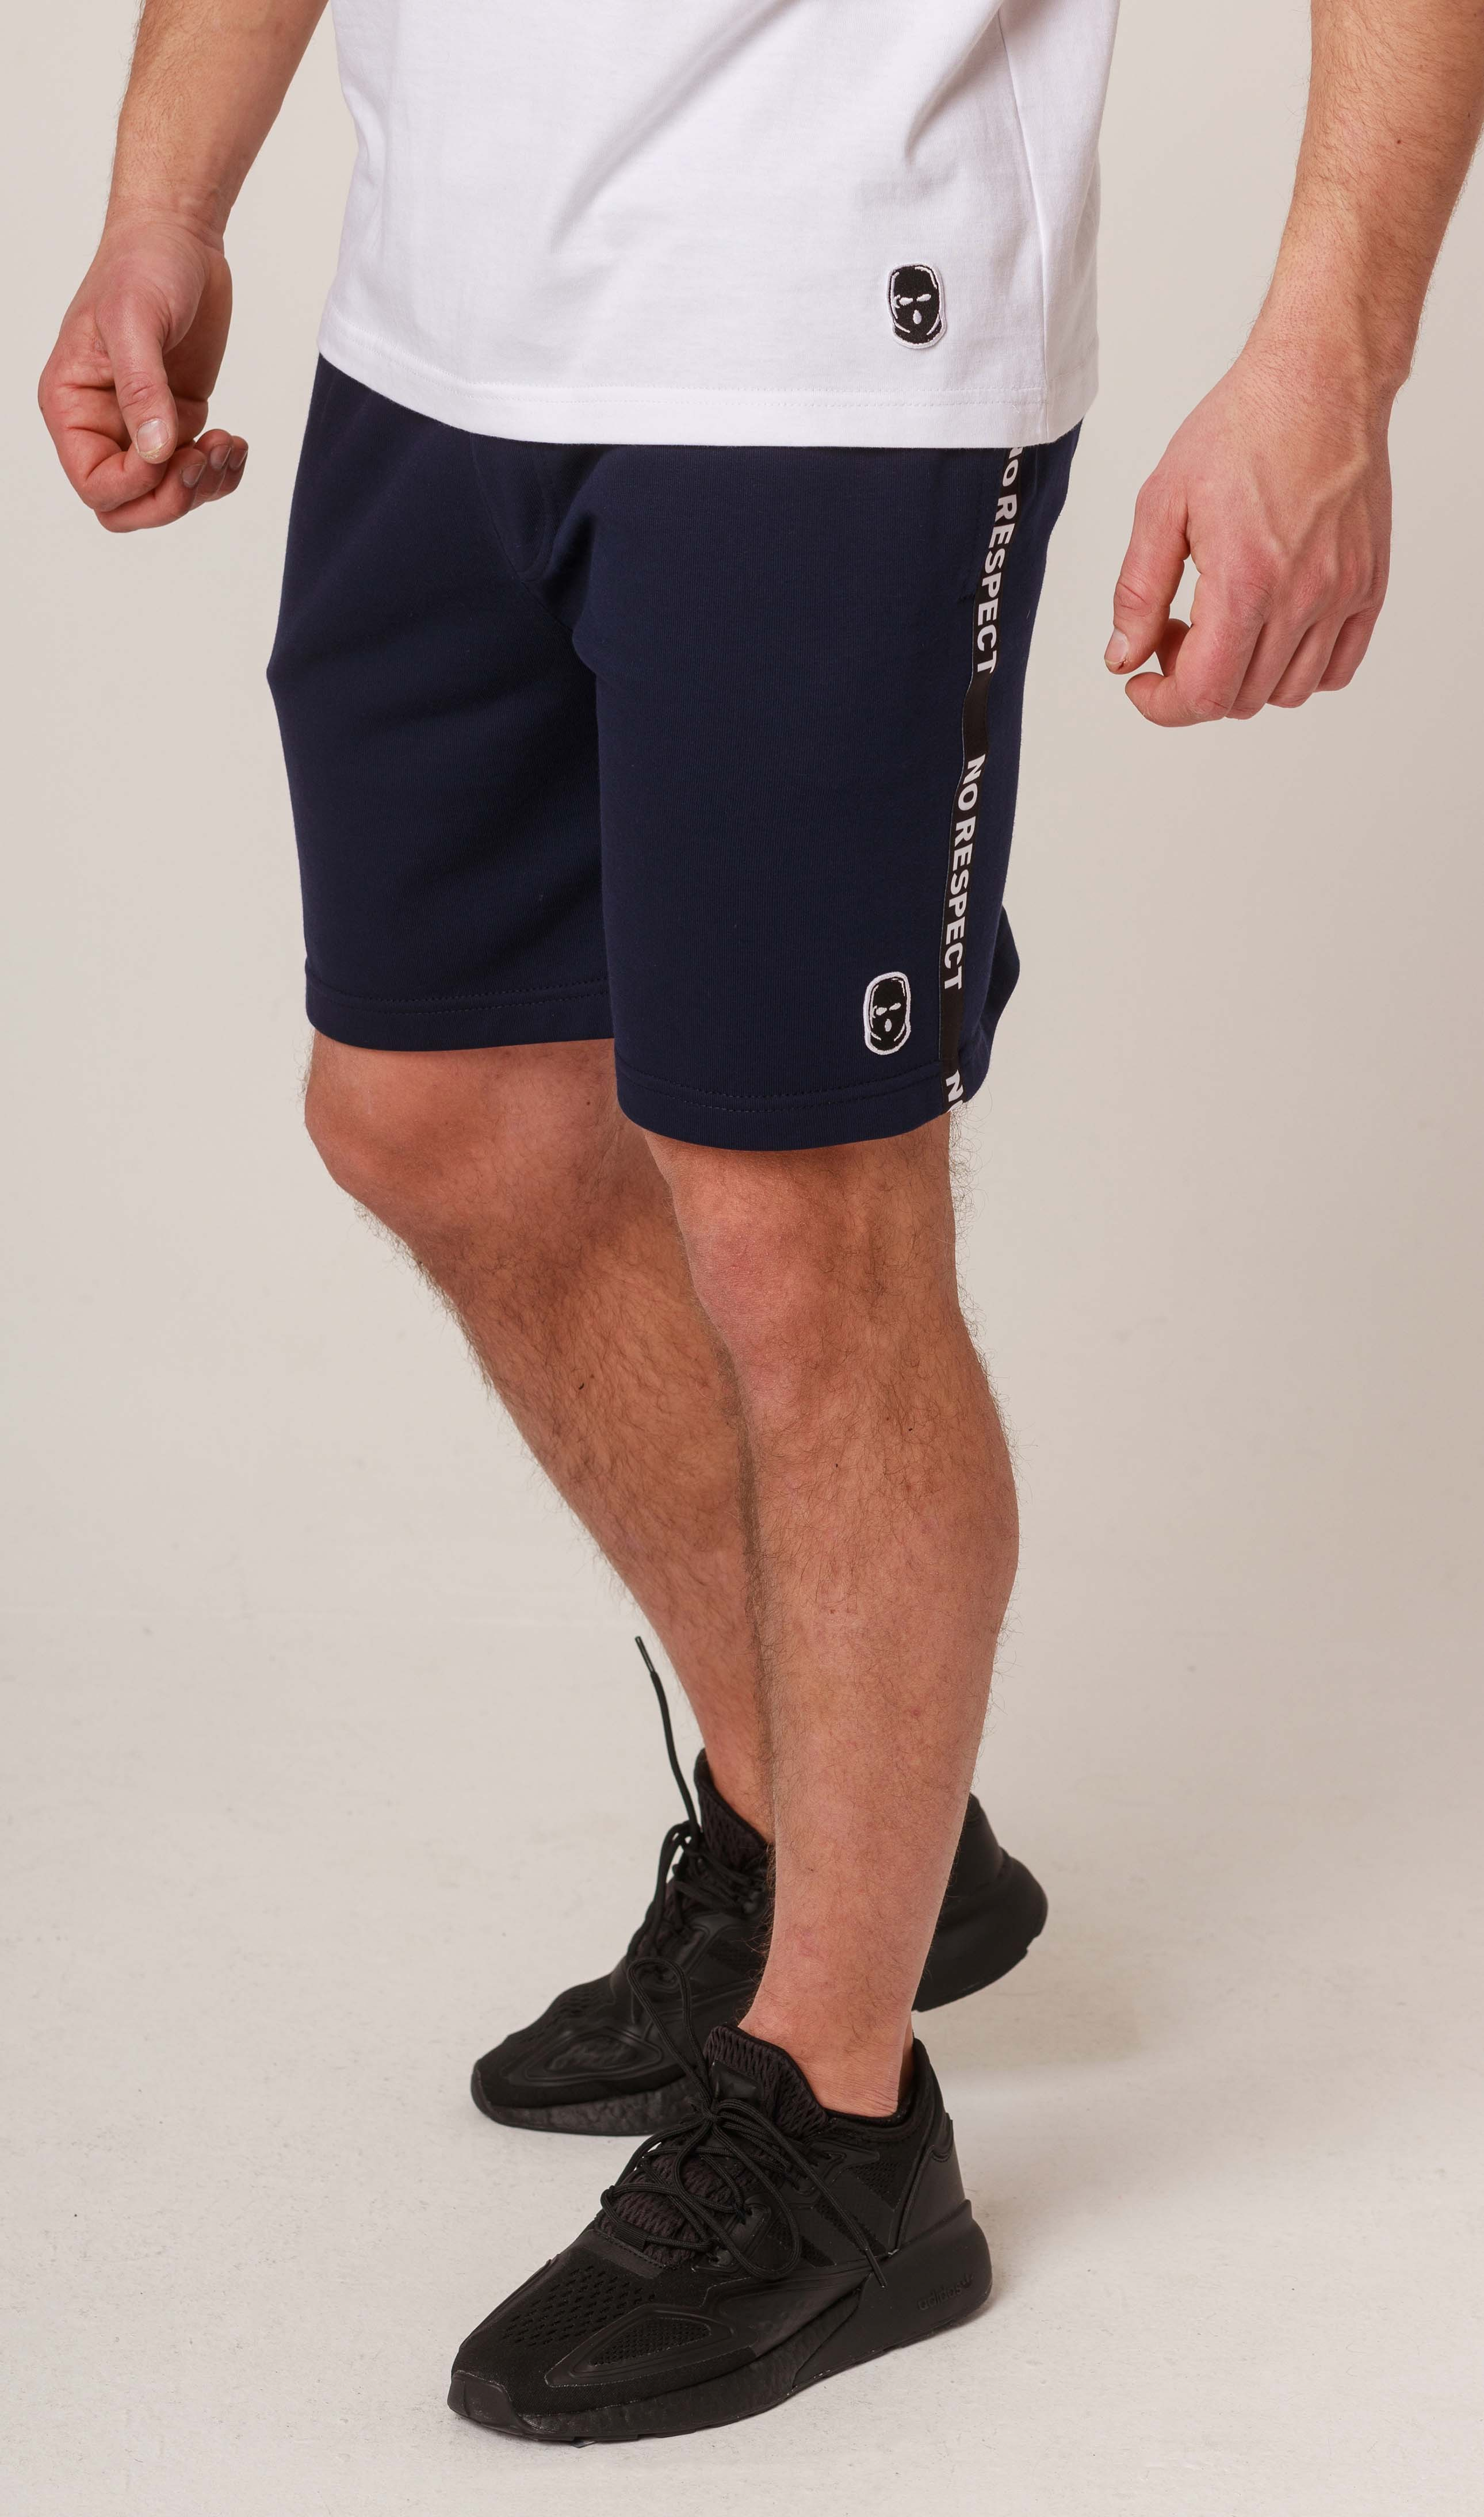 NRBSS202107 Shorts NO RESPECT Cotton Navy S